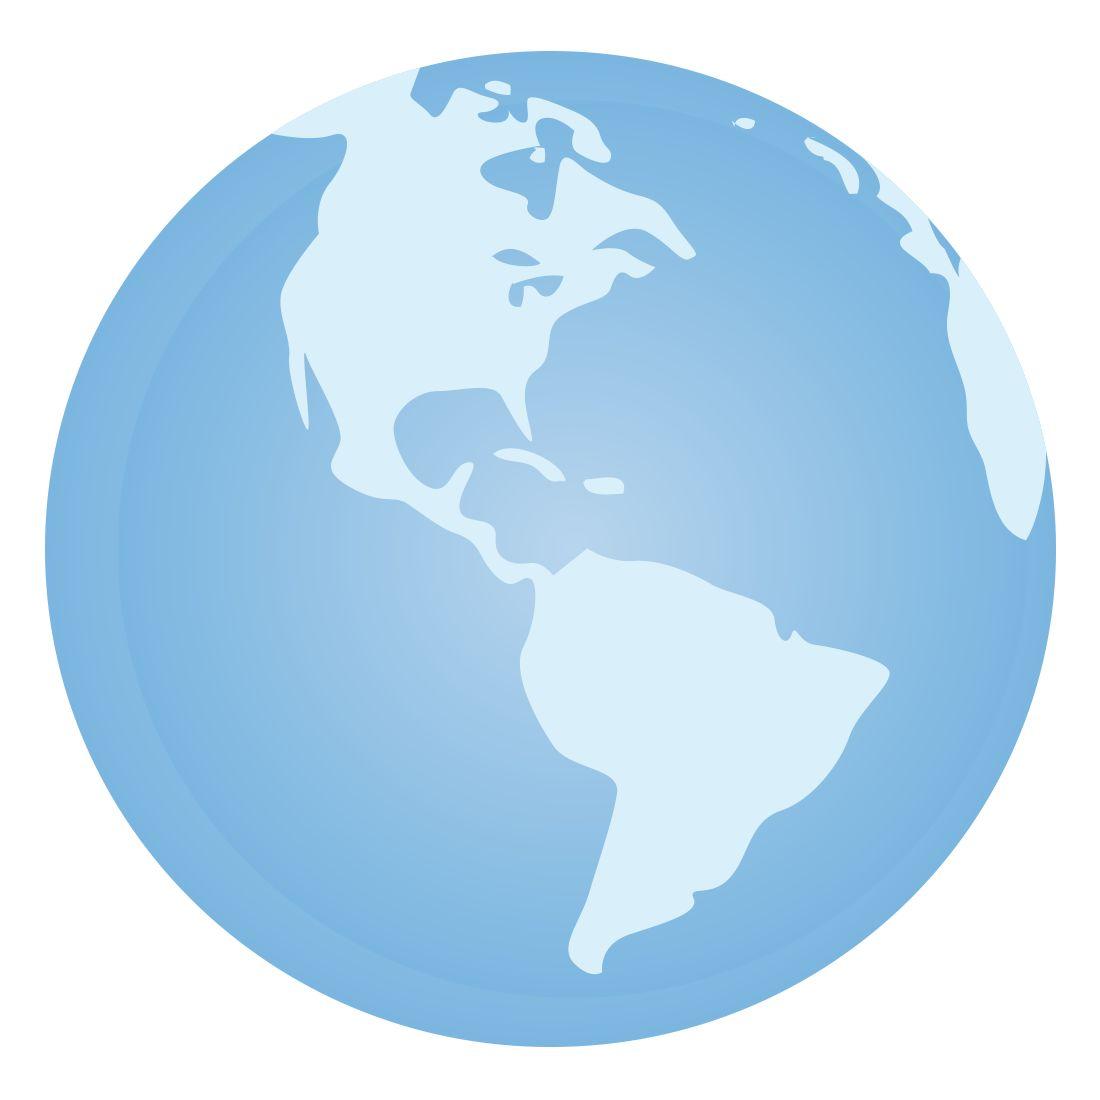 VPN服务-跨国企业首选-全球通流量-100M带宽-vpn系统 VPN 环境配置